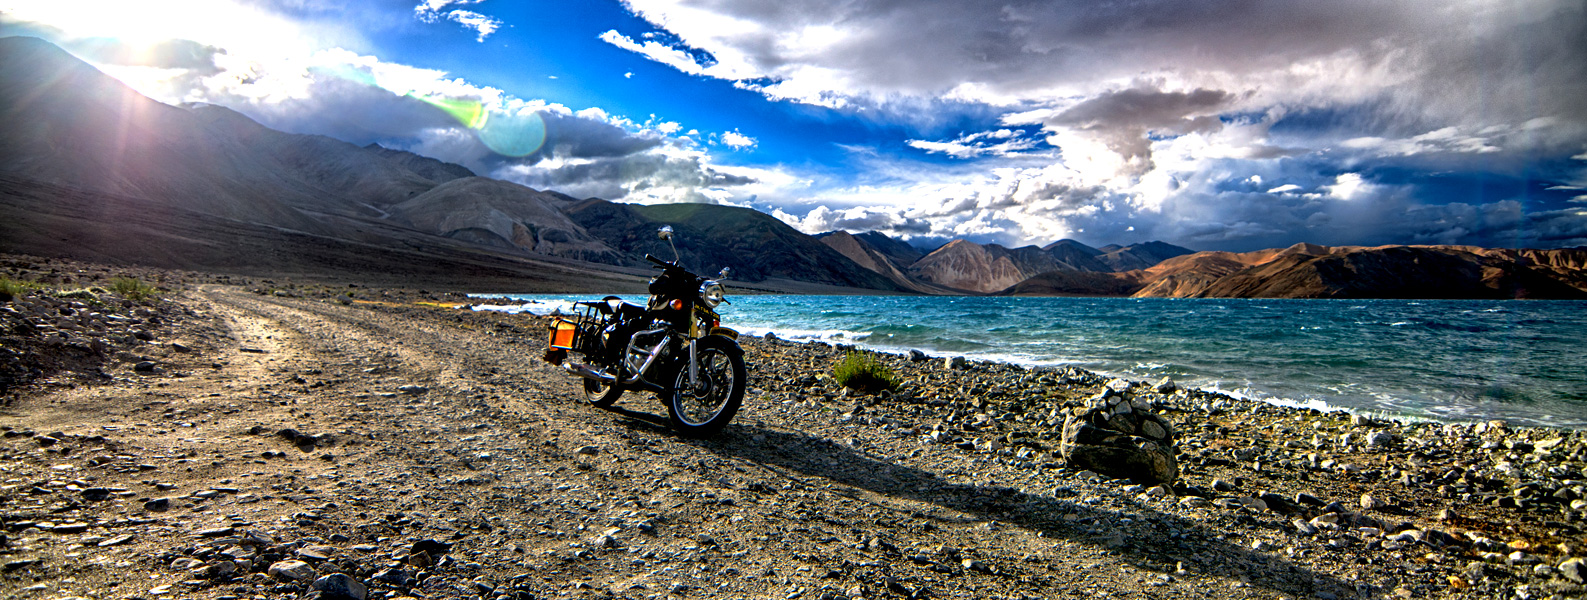 Manali Leh Bike Trip 9 Night 10 Days - Ladakh Road Trip